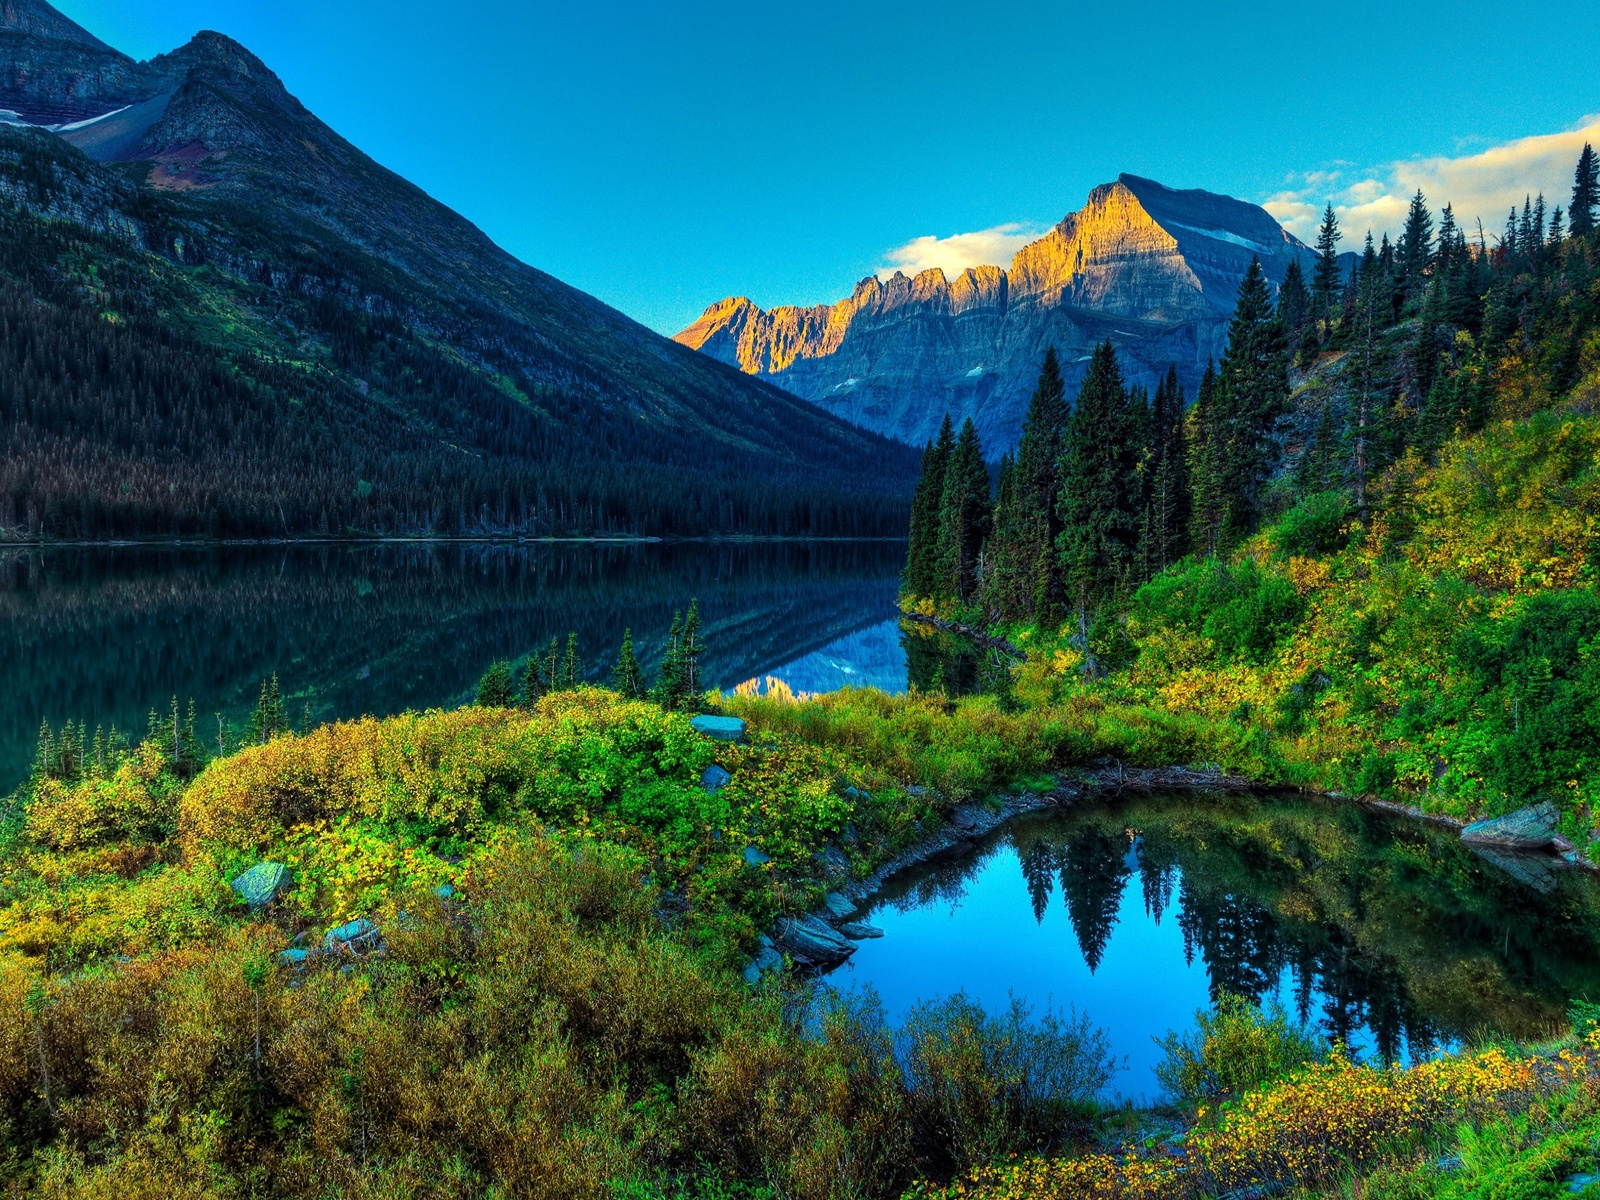 Mountain · Lake · Scenery. Normal 4:3 Resolutions:1152 x 864 1024 x 768 1280 x 960 ...